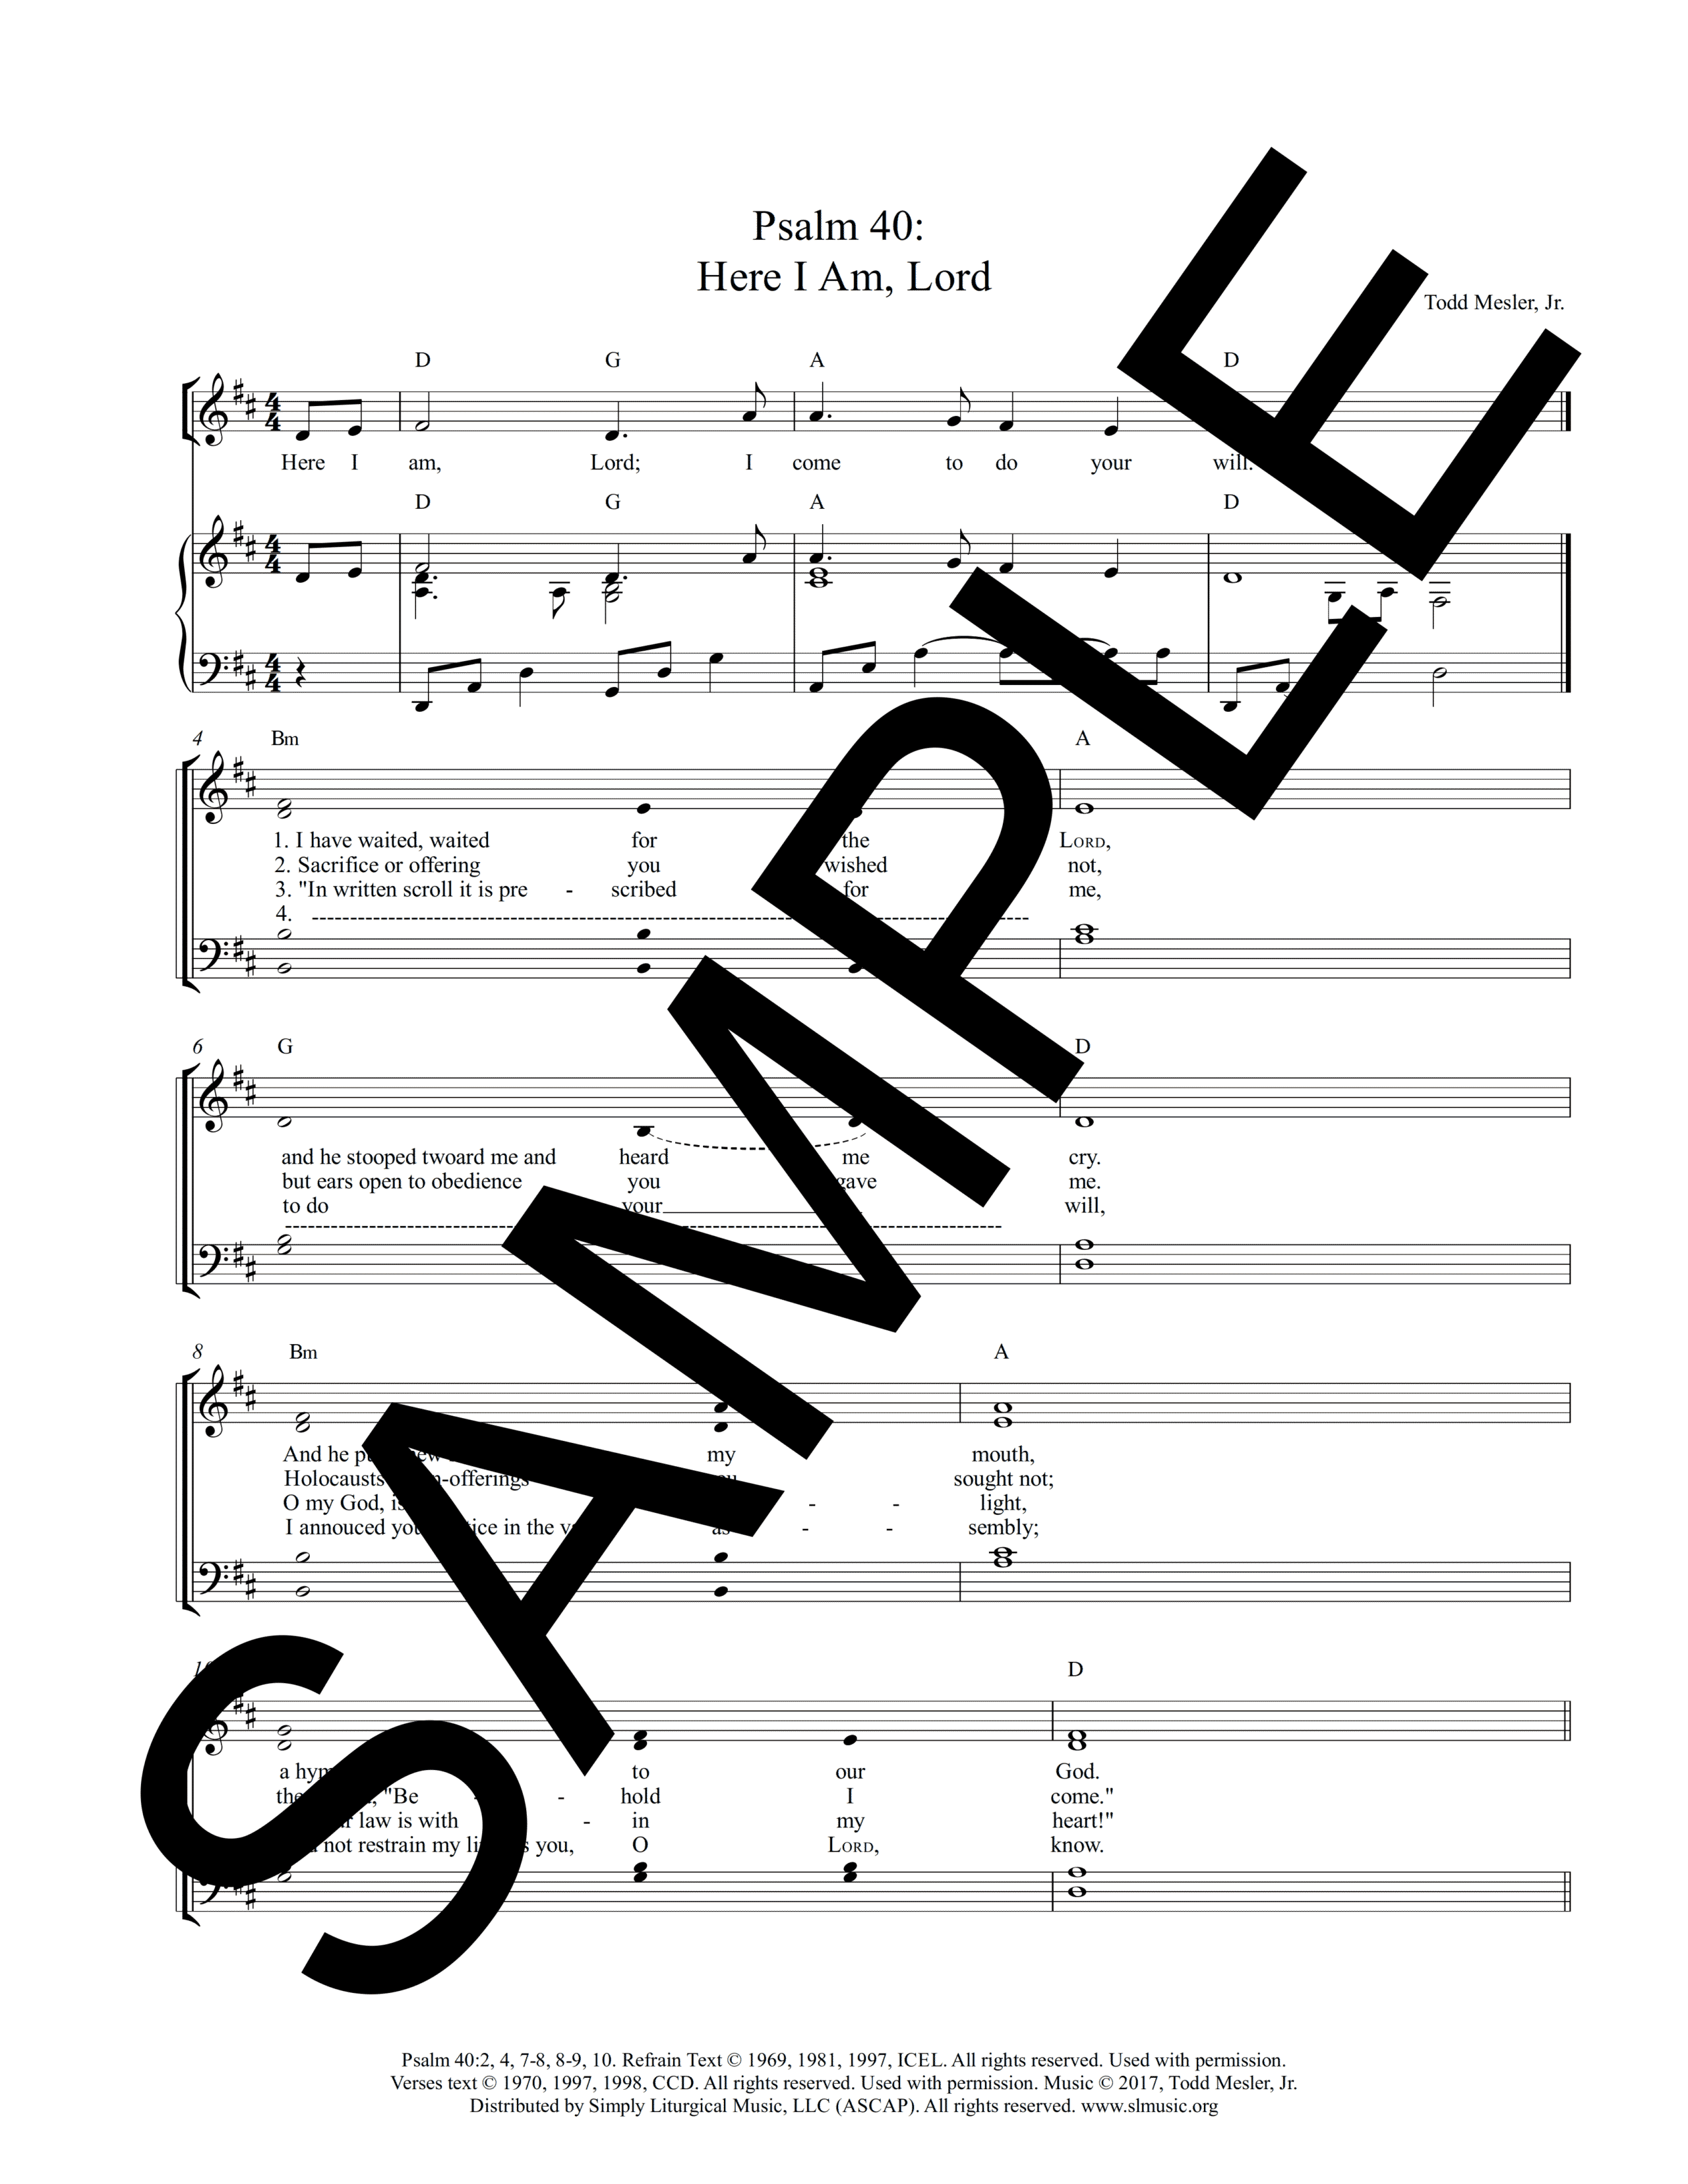 Psalm 40 Here I Am Lord Mesler Sample Lead Sheet